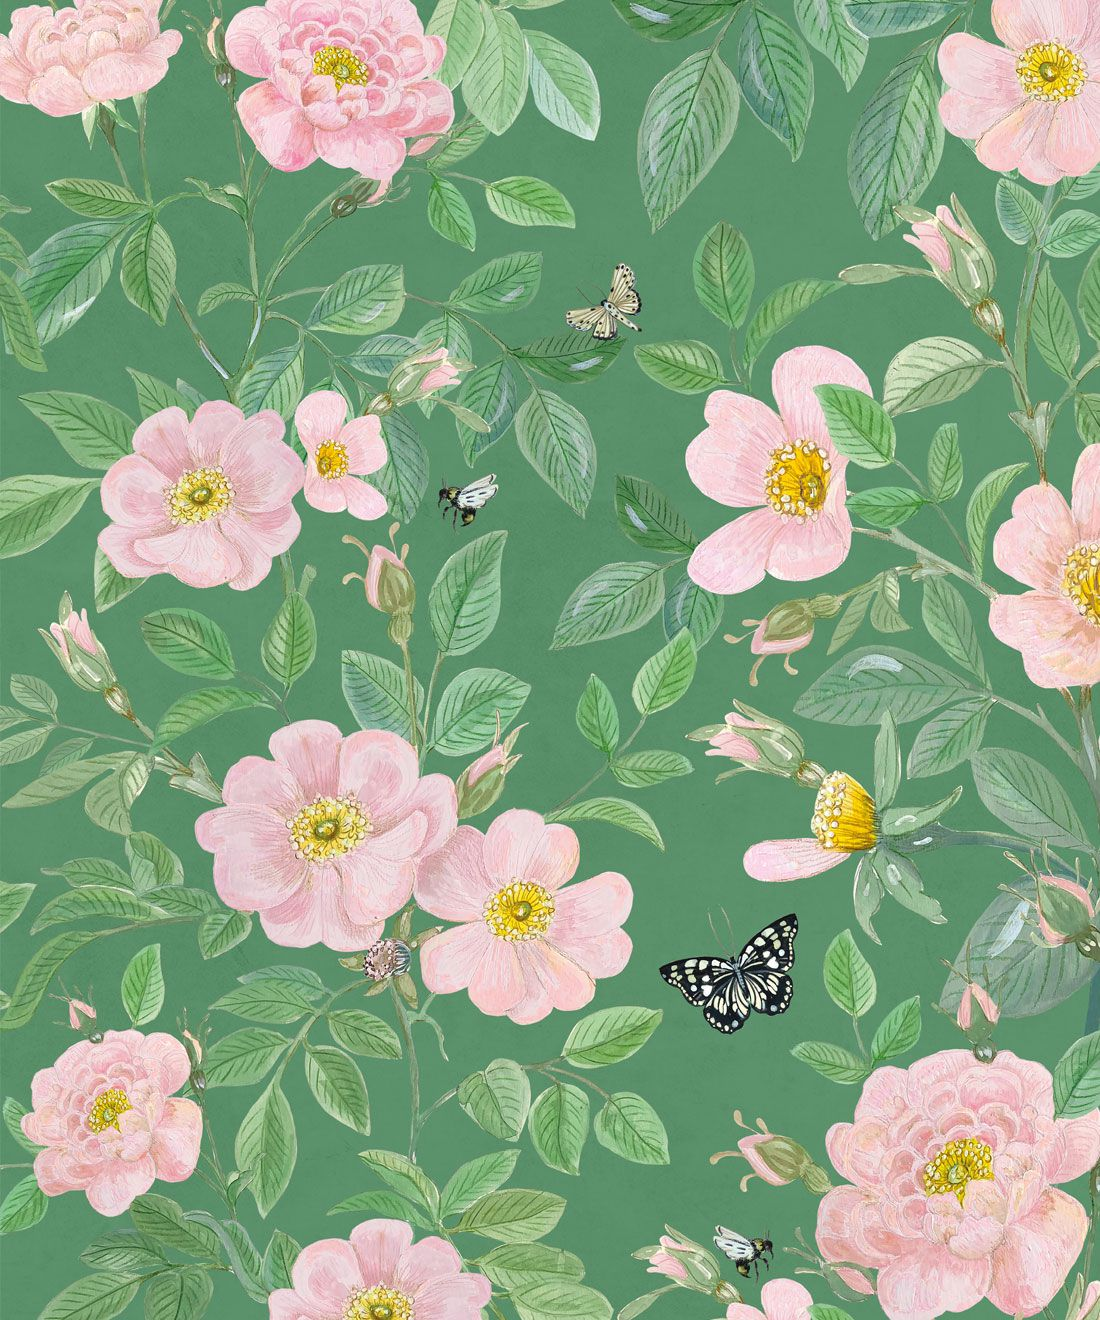 Rosa Wallpaper • Floral Wallpaper •Forest Green • Swatch